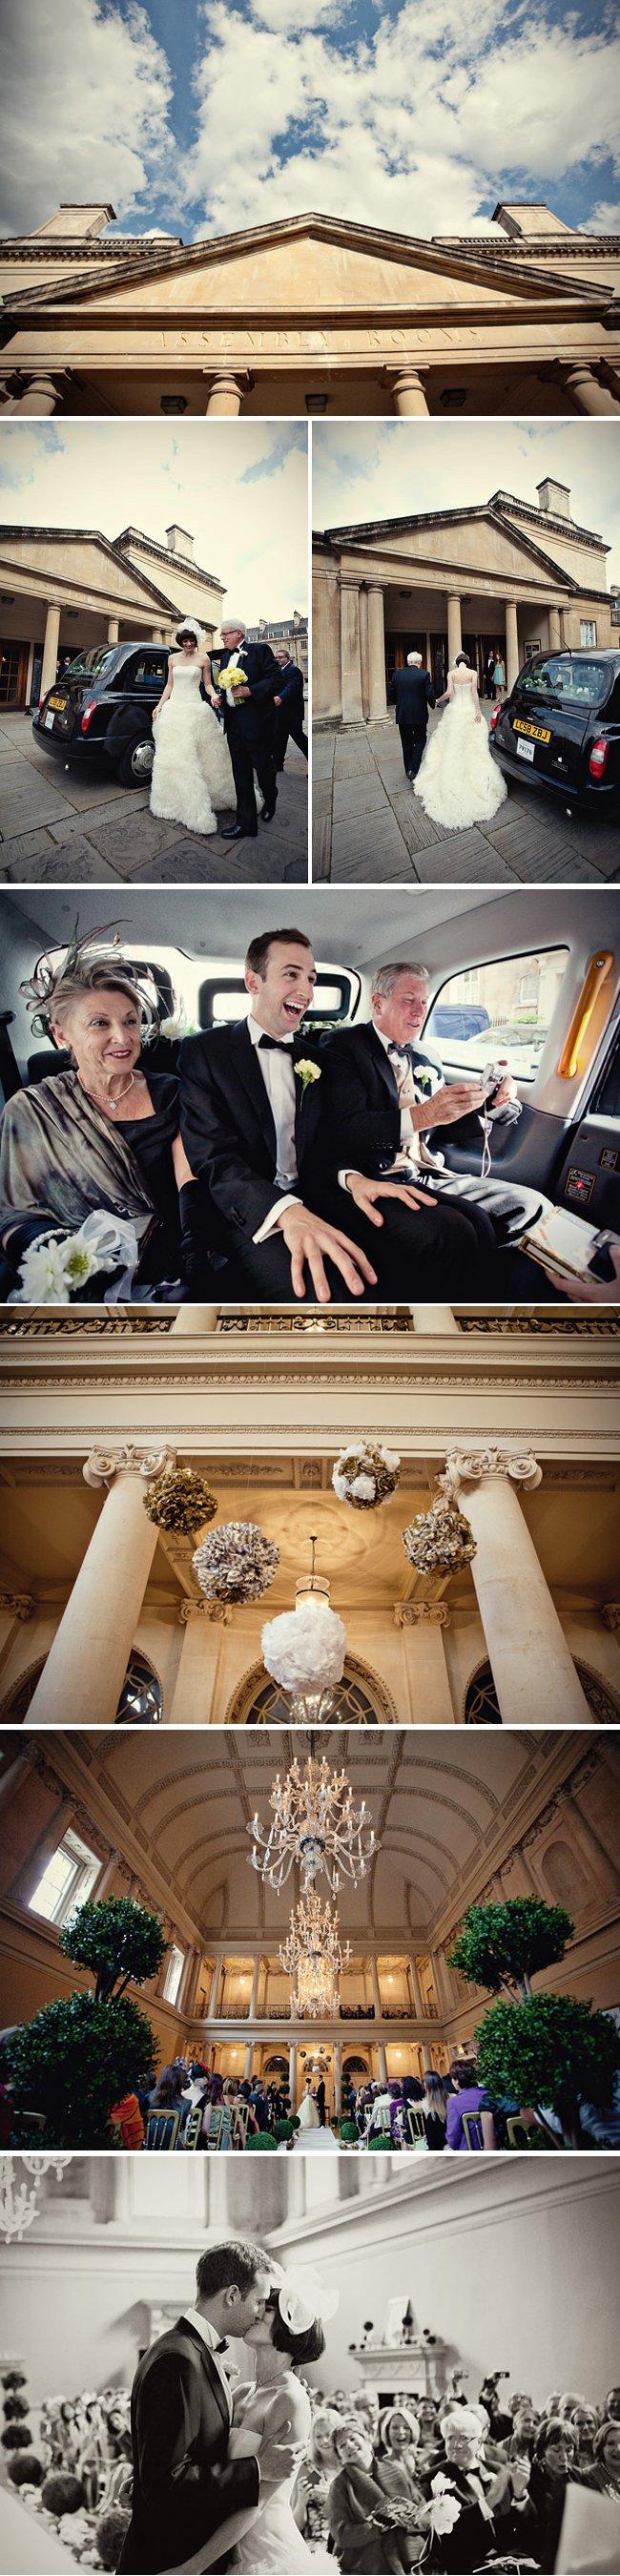 london real wedding elegant ceremony venue